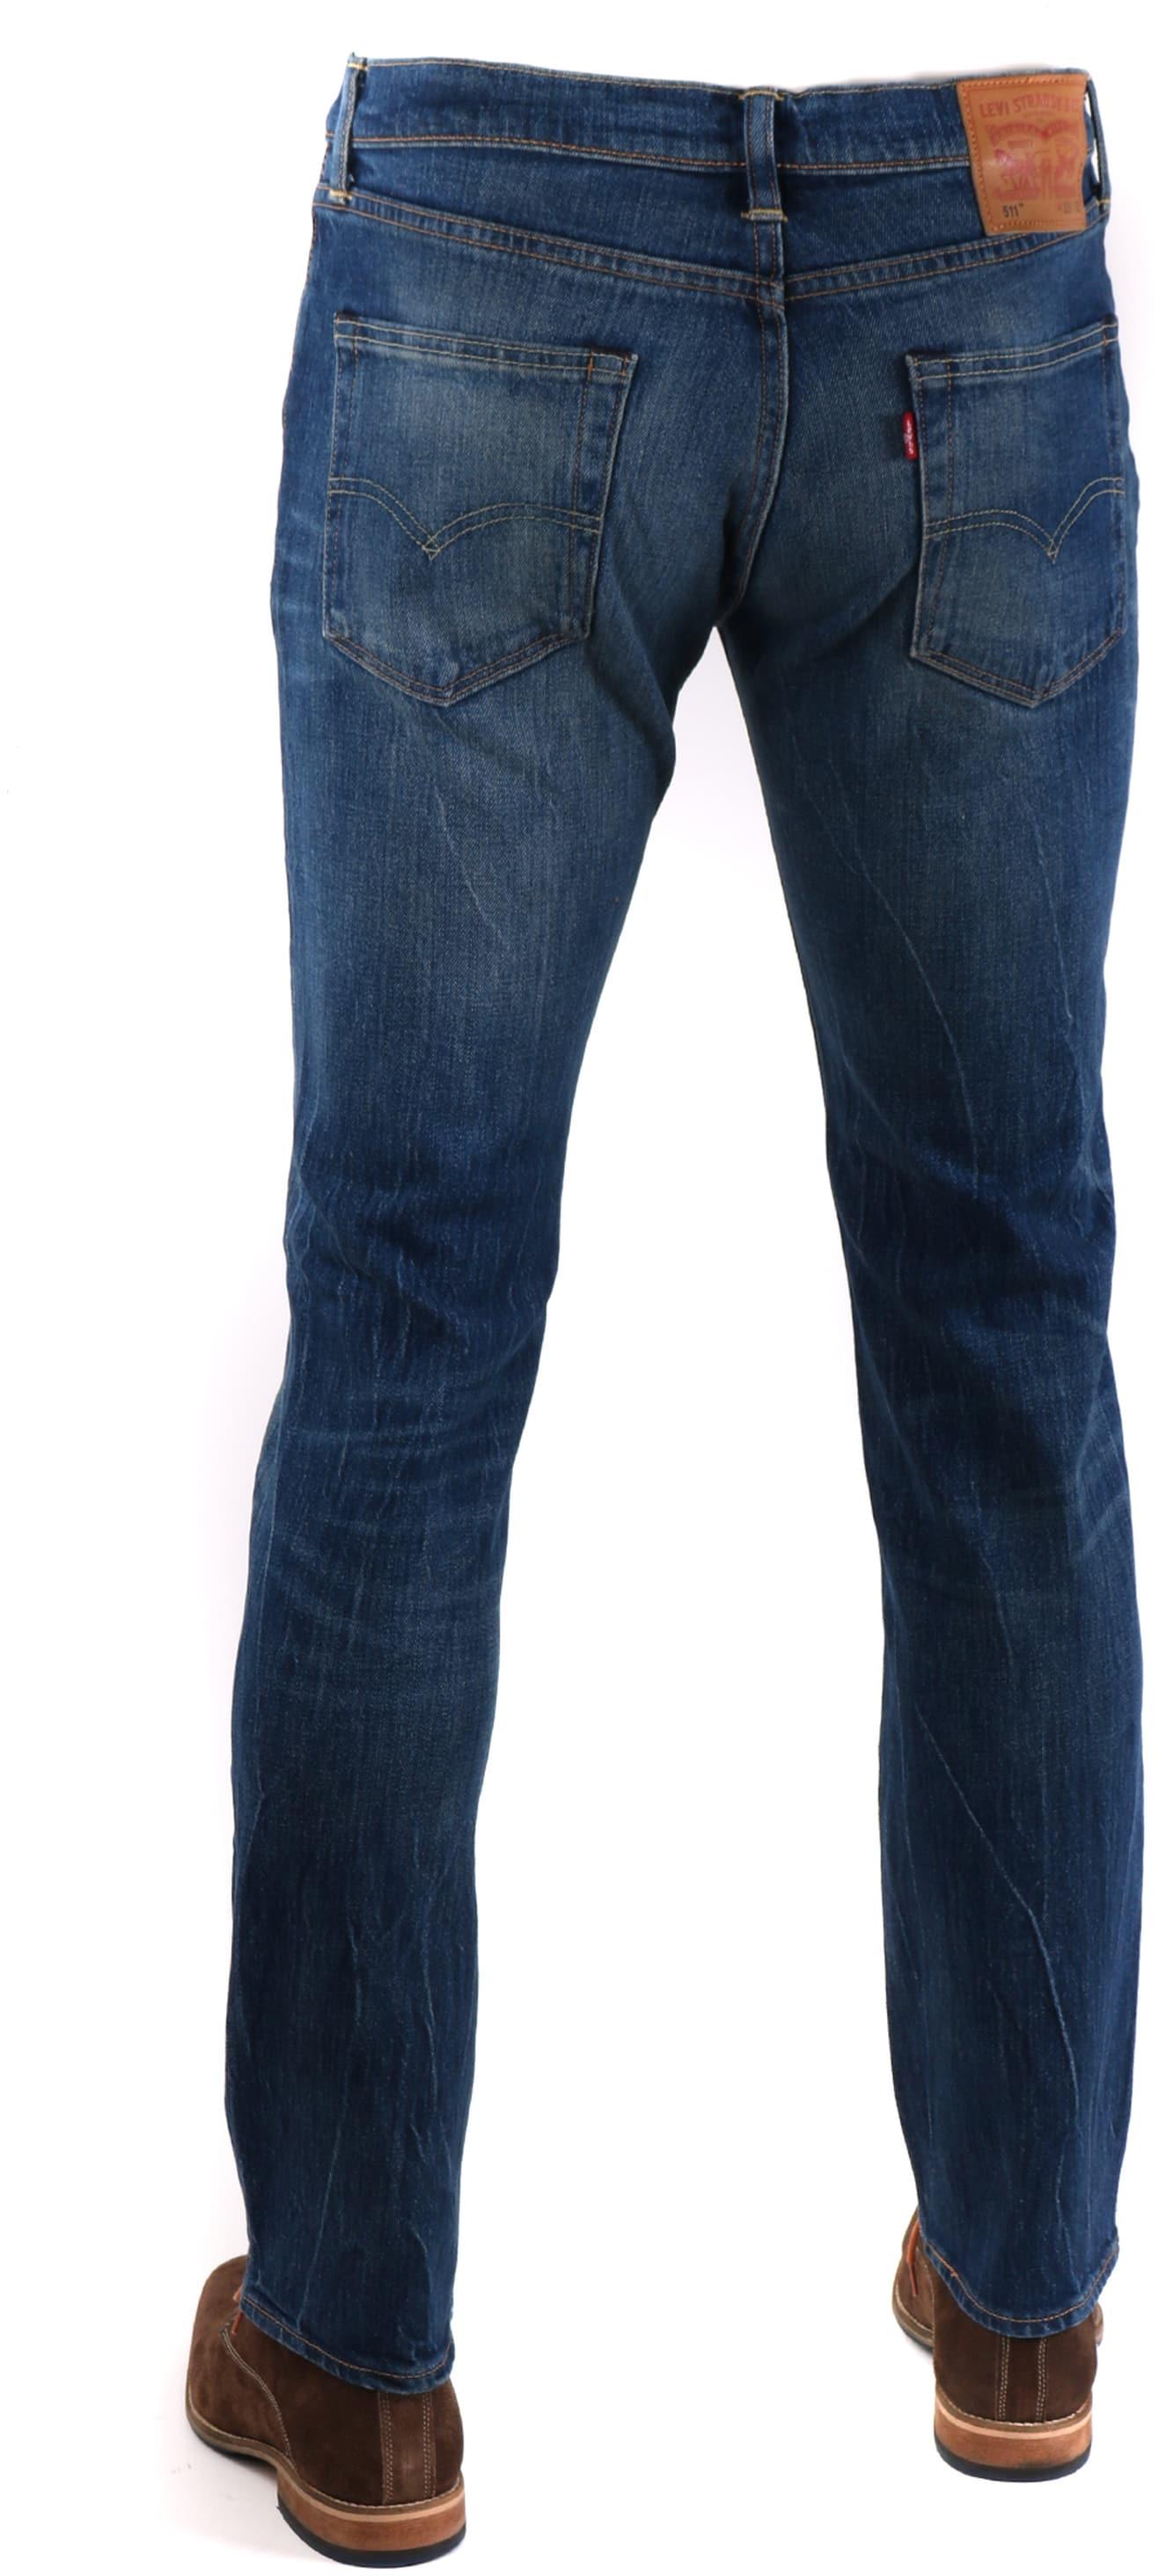 Levi's 511 Jeans Slim Fit 1876 foto 3